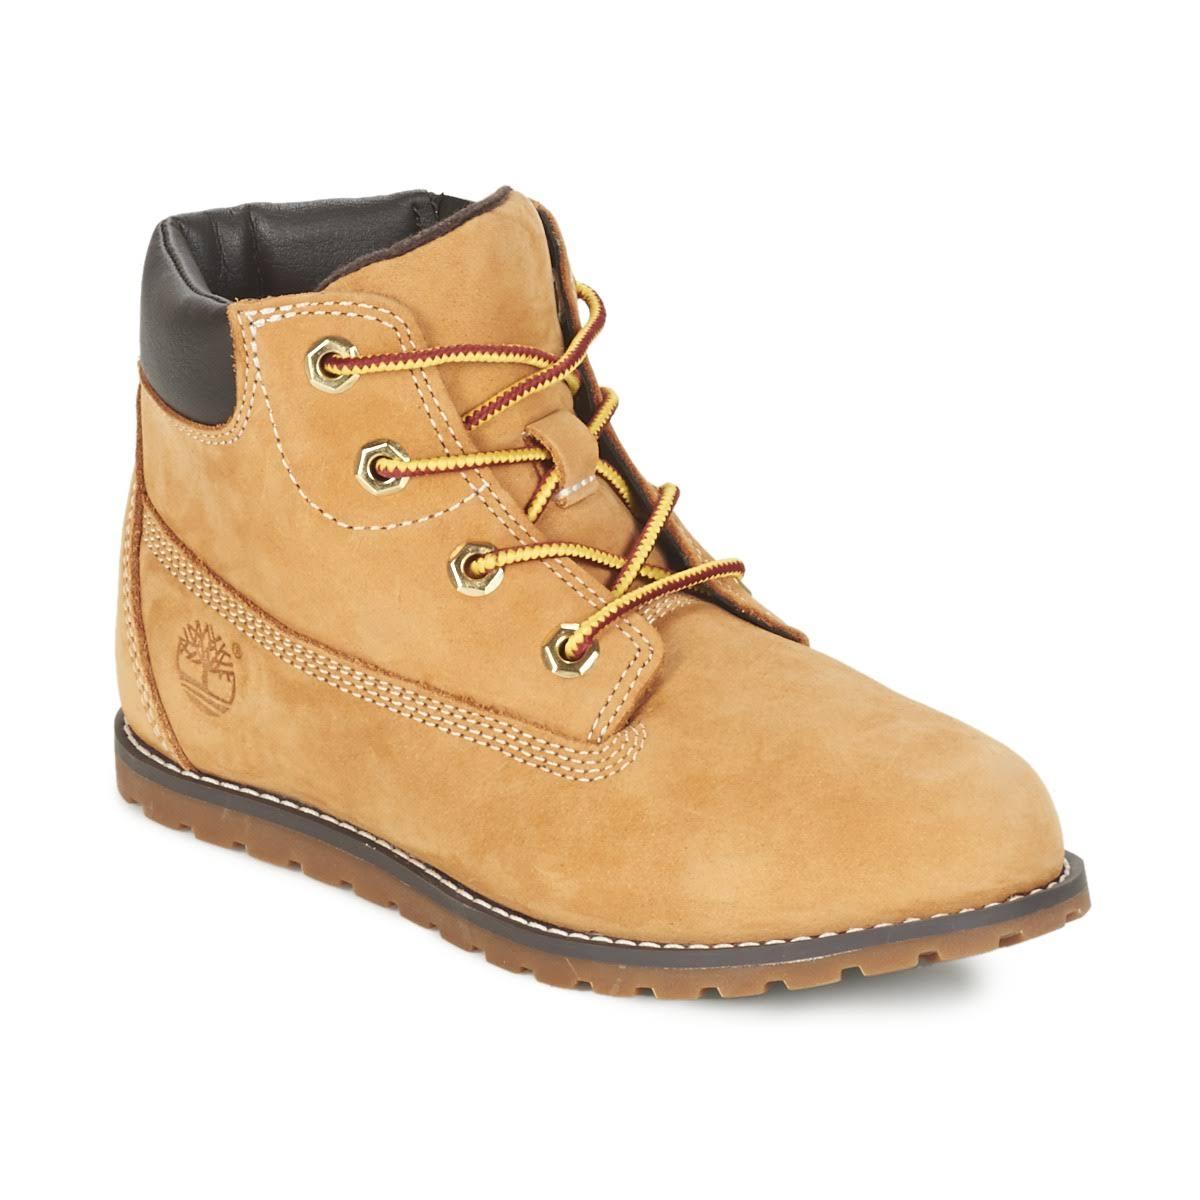 Botines Pokey Timberland Beige With Boot 6in Pine 04wxaCxgq